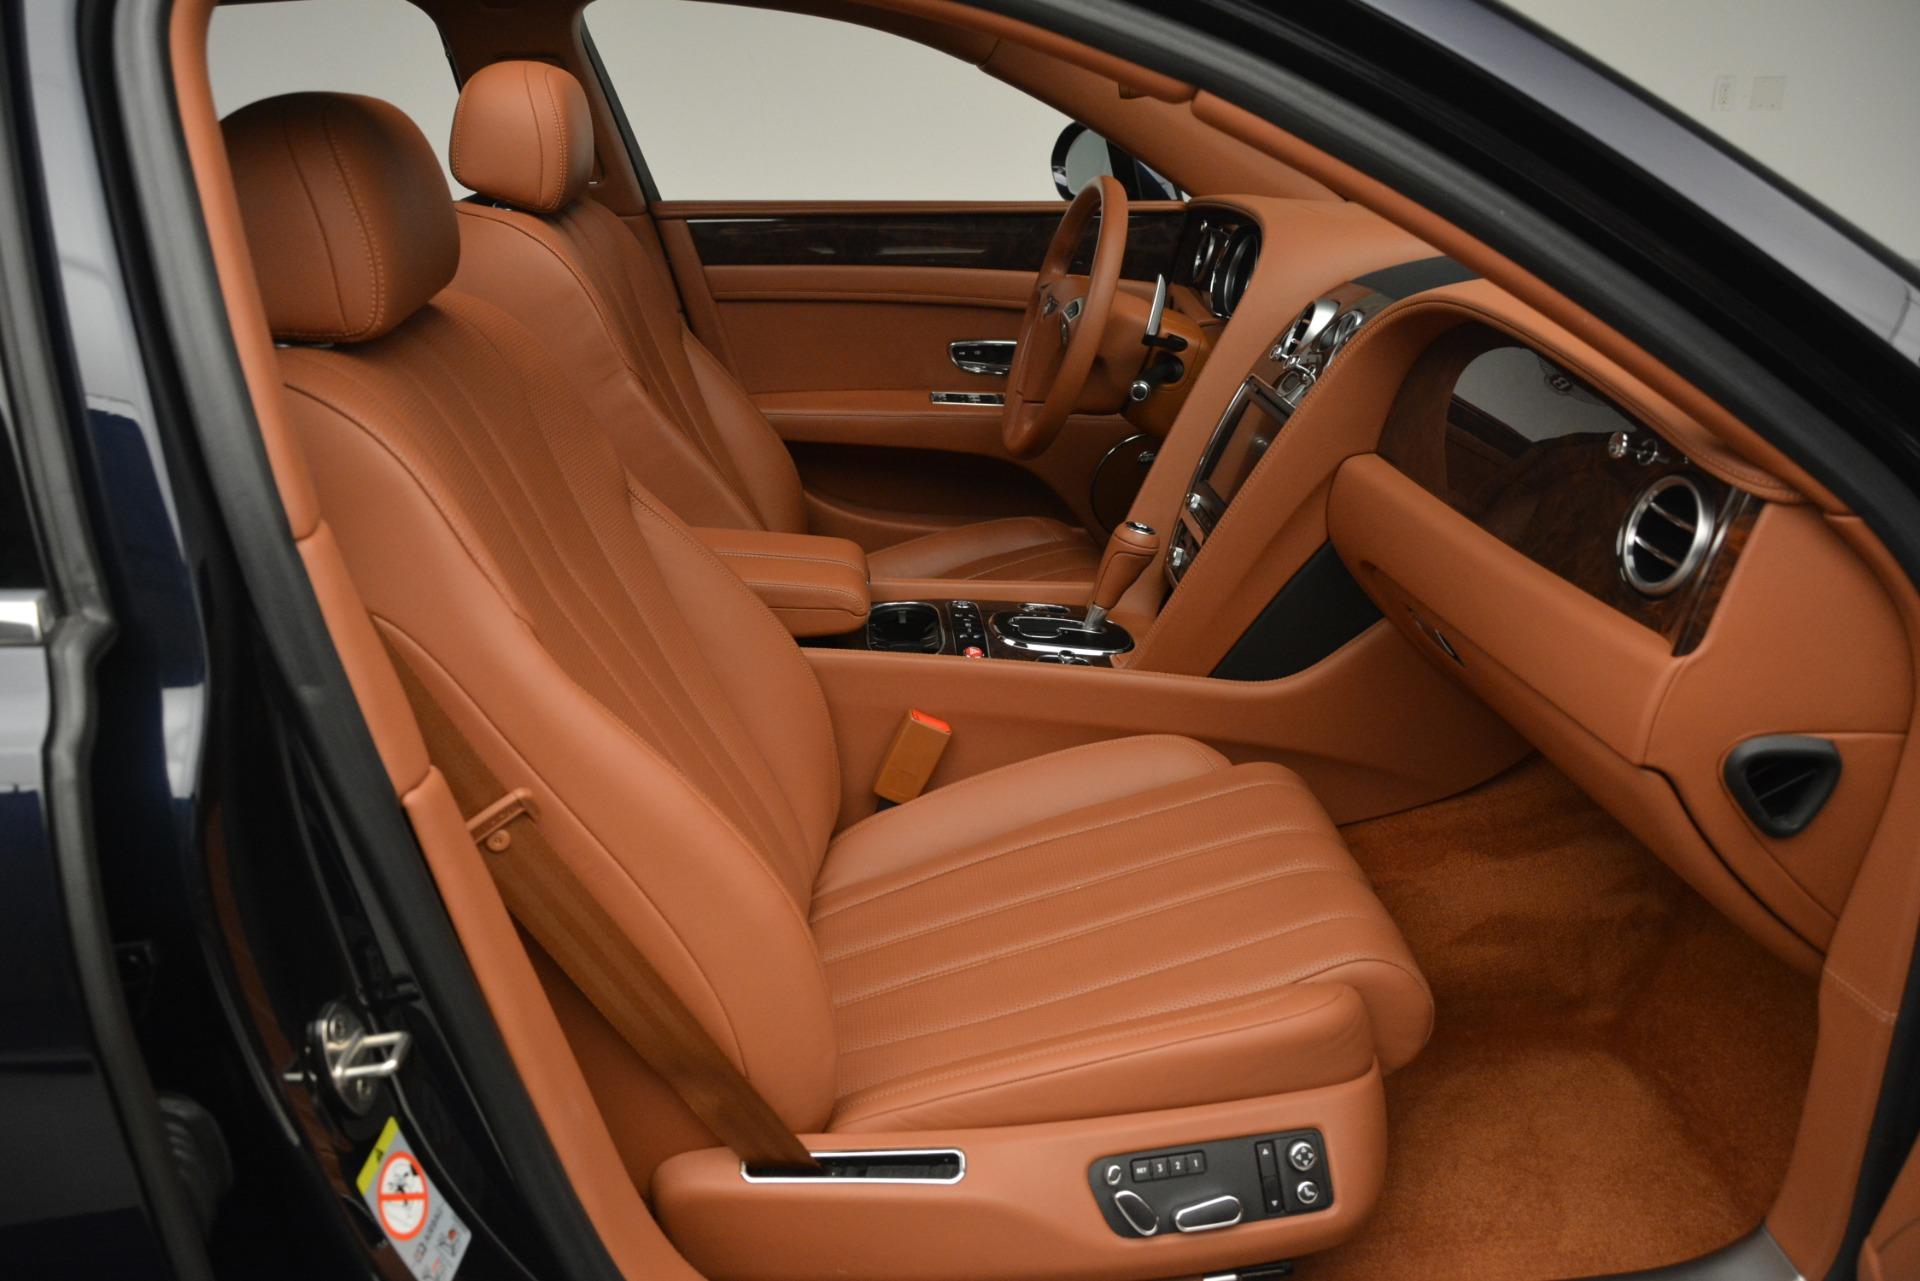 Used 2016 Bentley Flying Spur W12 For Sale In Westport, CT 2943_p28